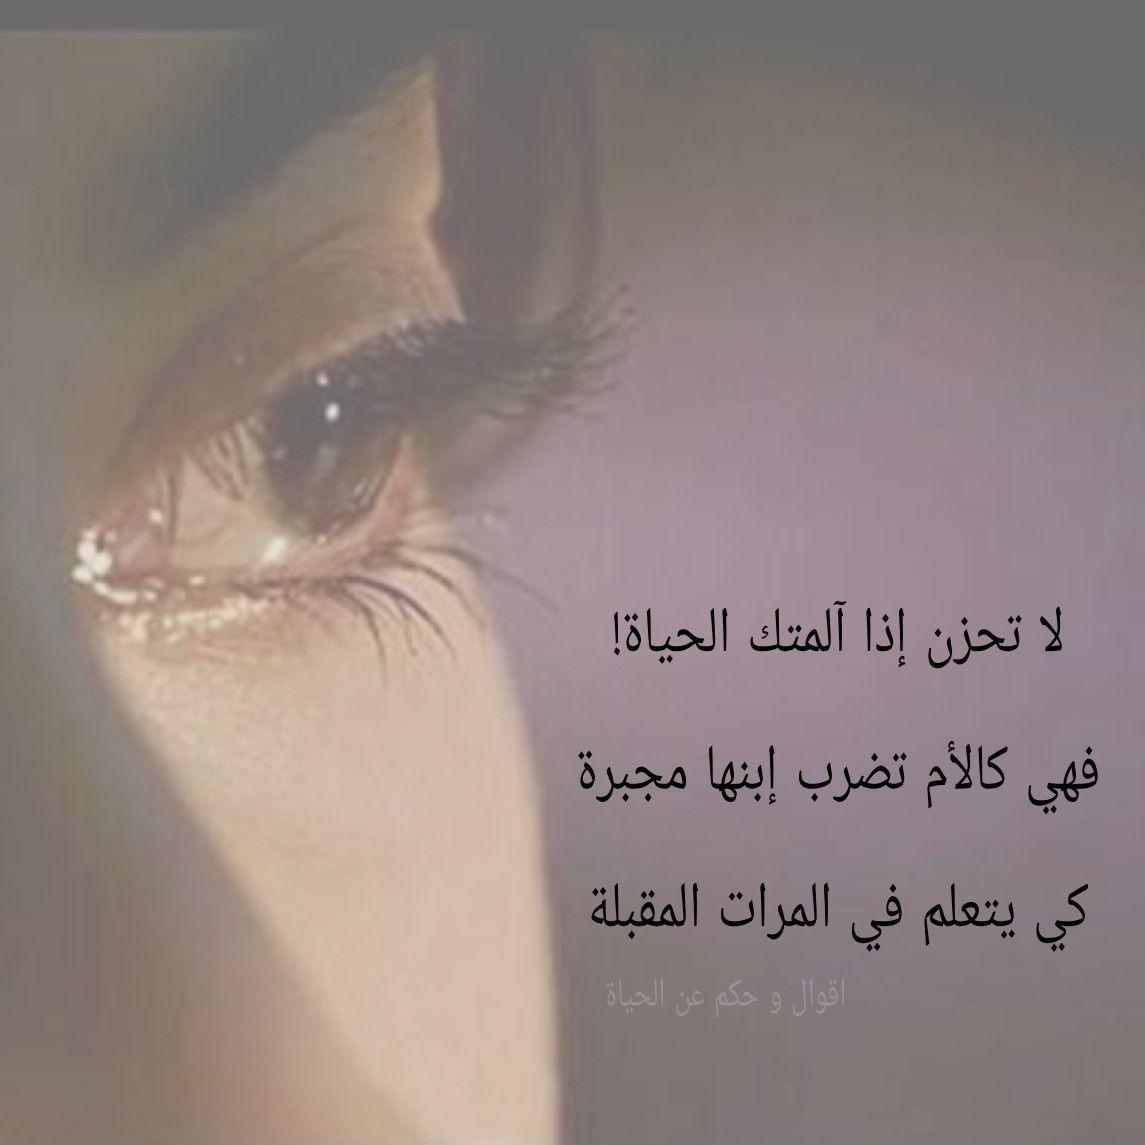 Pin By اقوال و حكم عن الحياة On اقوال و حكم عن الحياة Arabic Quotes Arabic Words Words